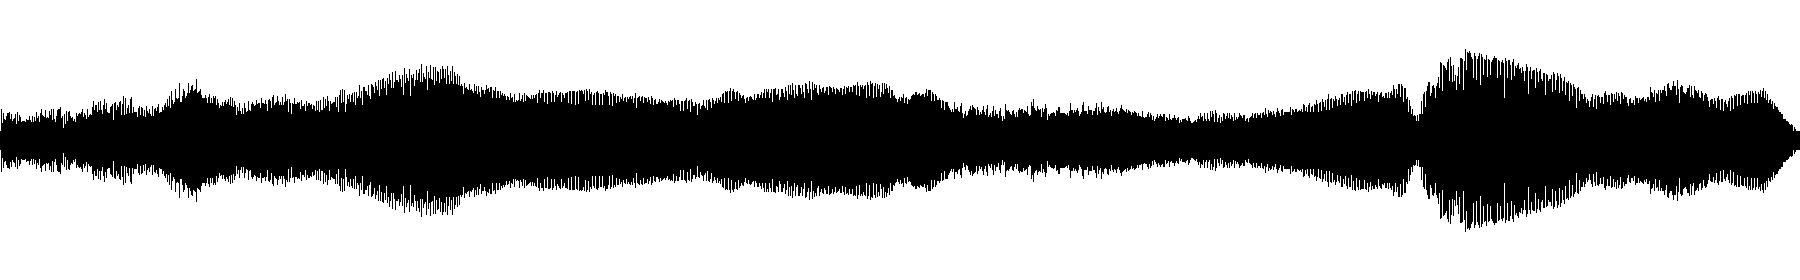 vocal 11